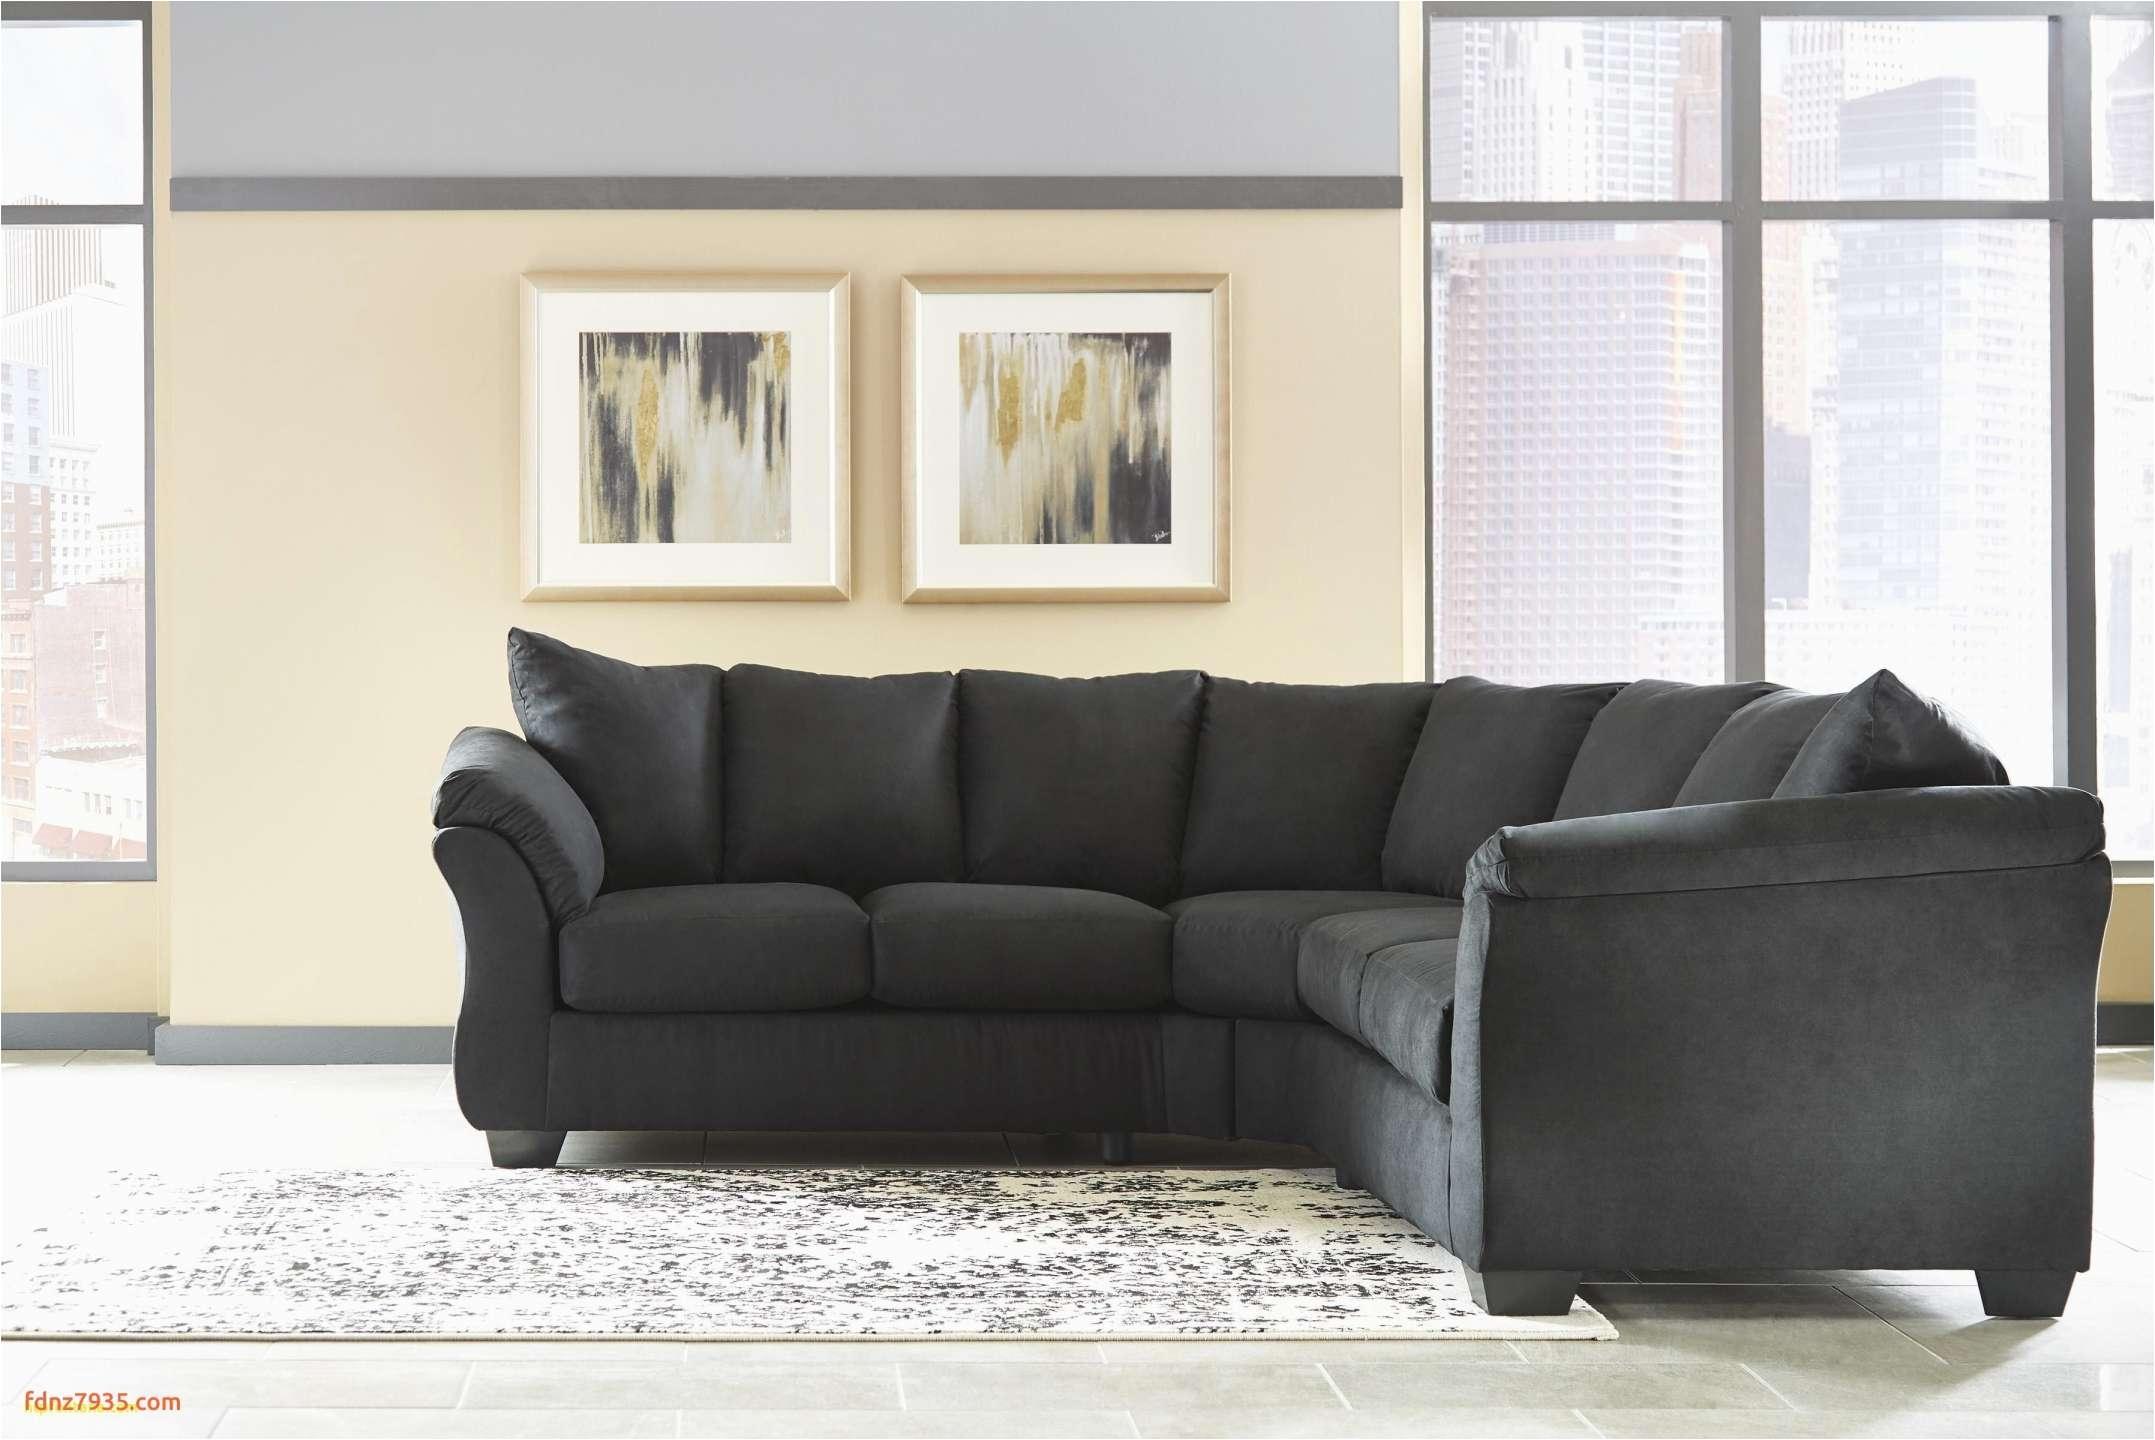 modern leather sofa set fresh sofa design inspiration for furniture stores close to me